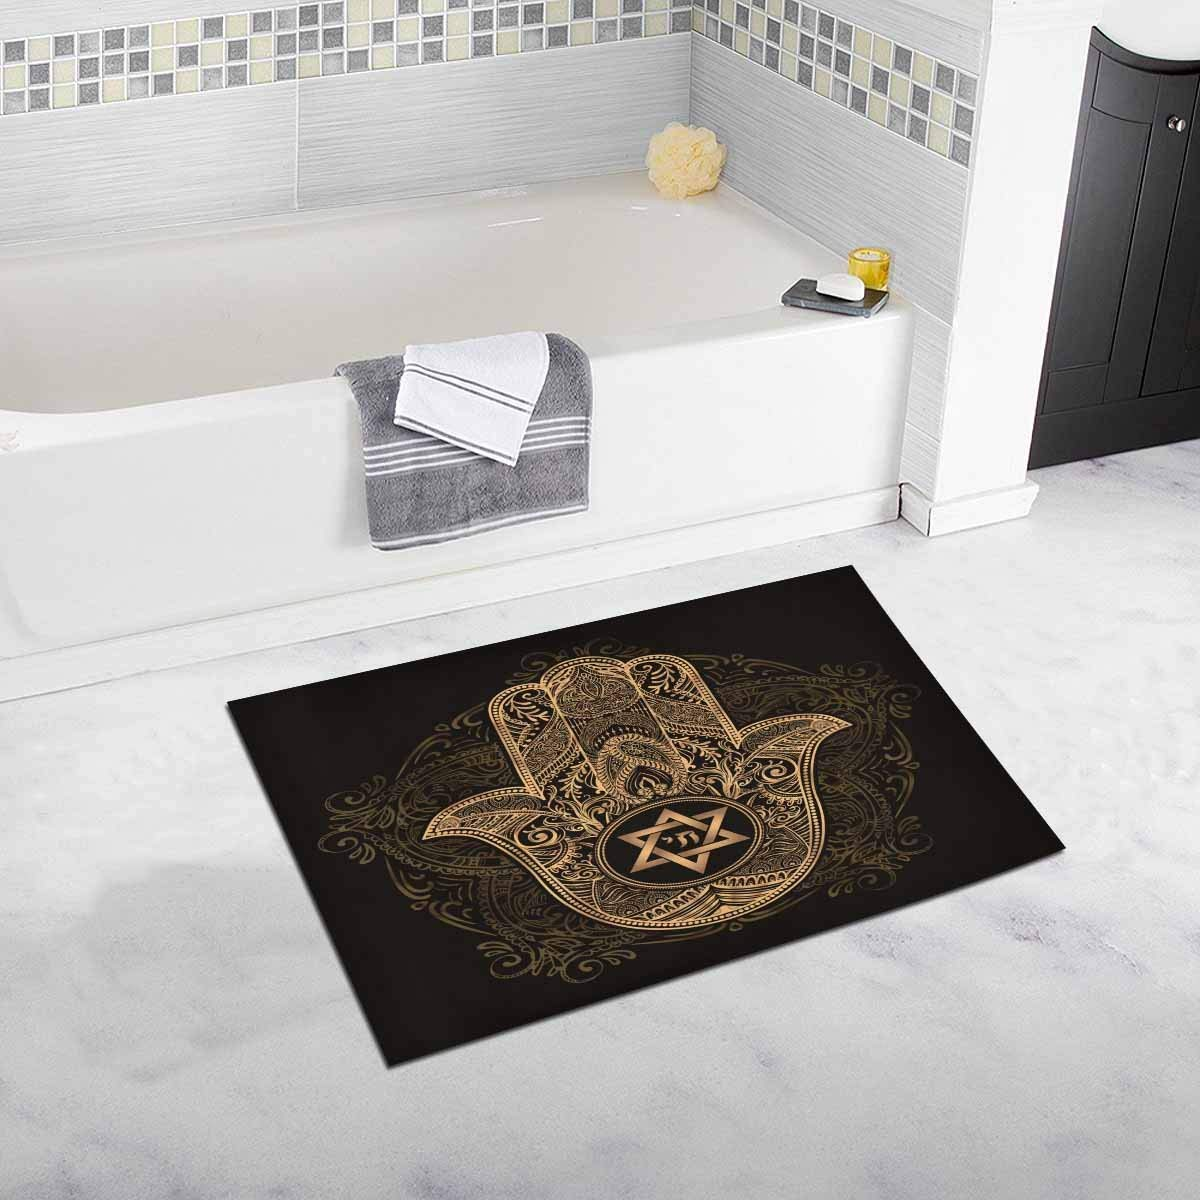 Elegant Traditional Jewish Soft Shaggy Bath Mat Non-slip Rubber Bathroom Rug Floor Mats